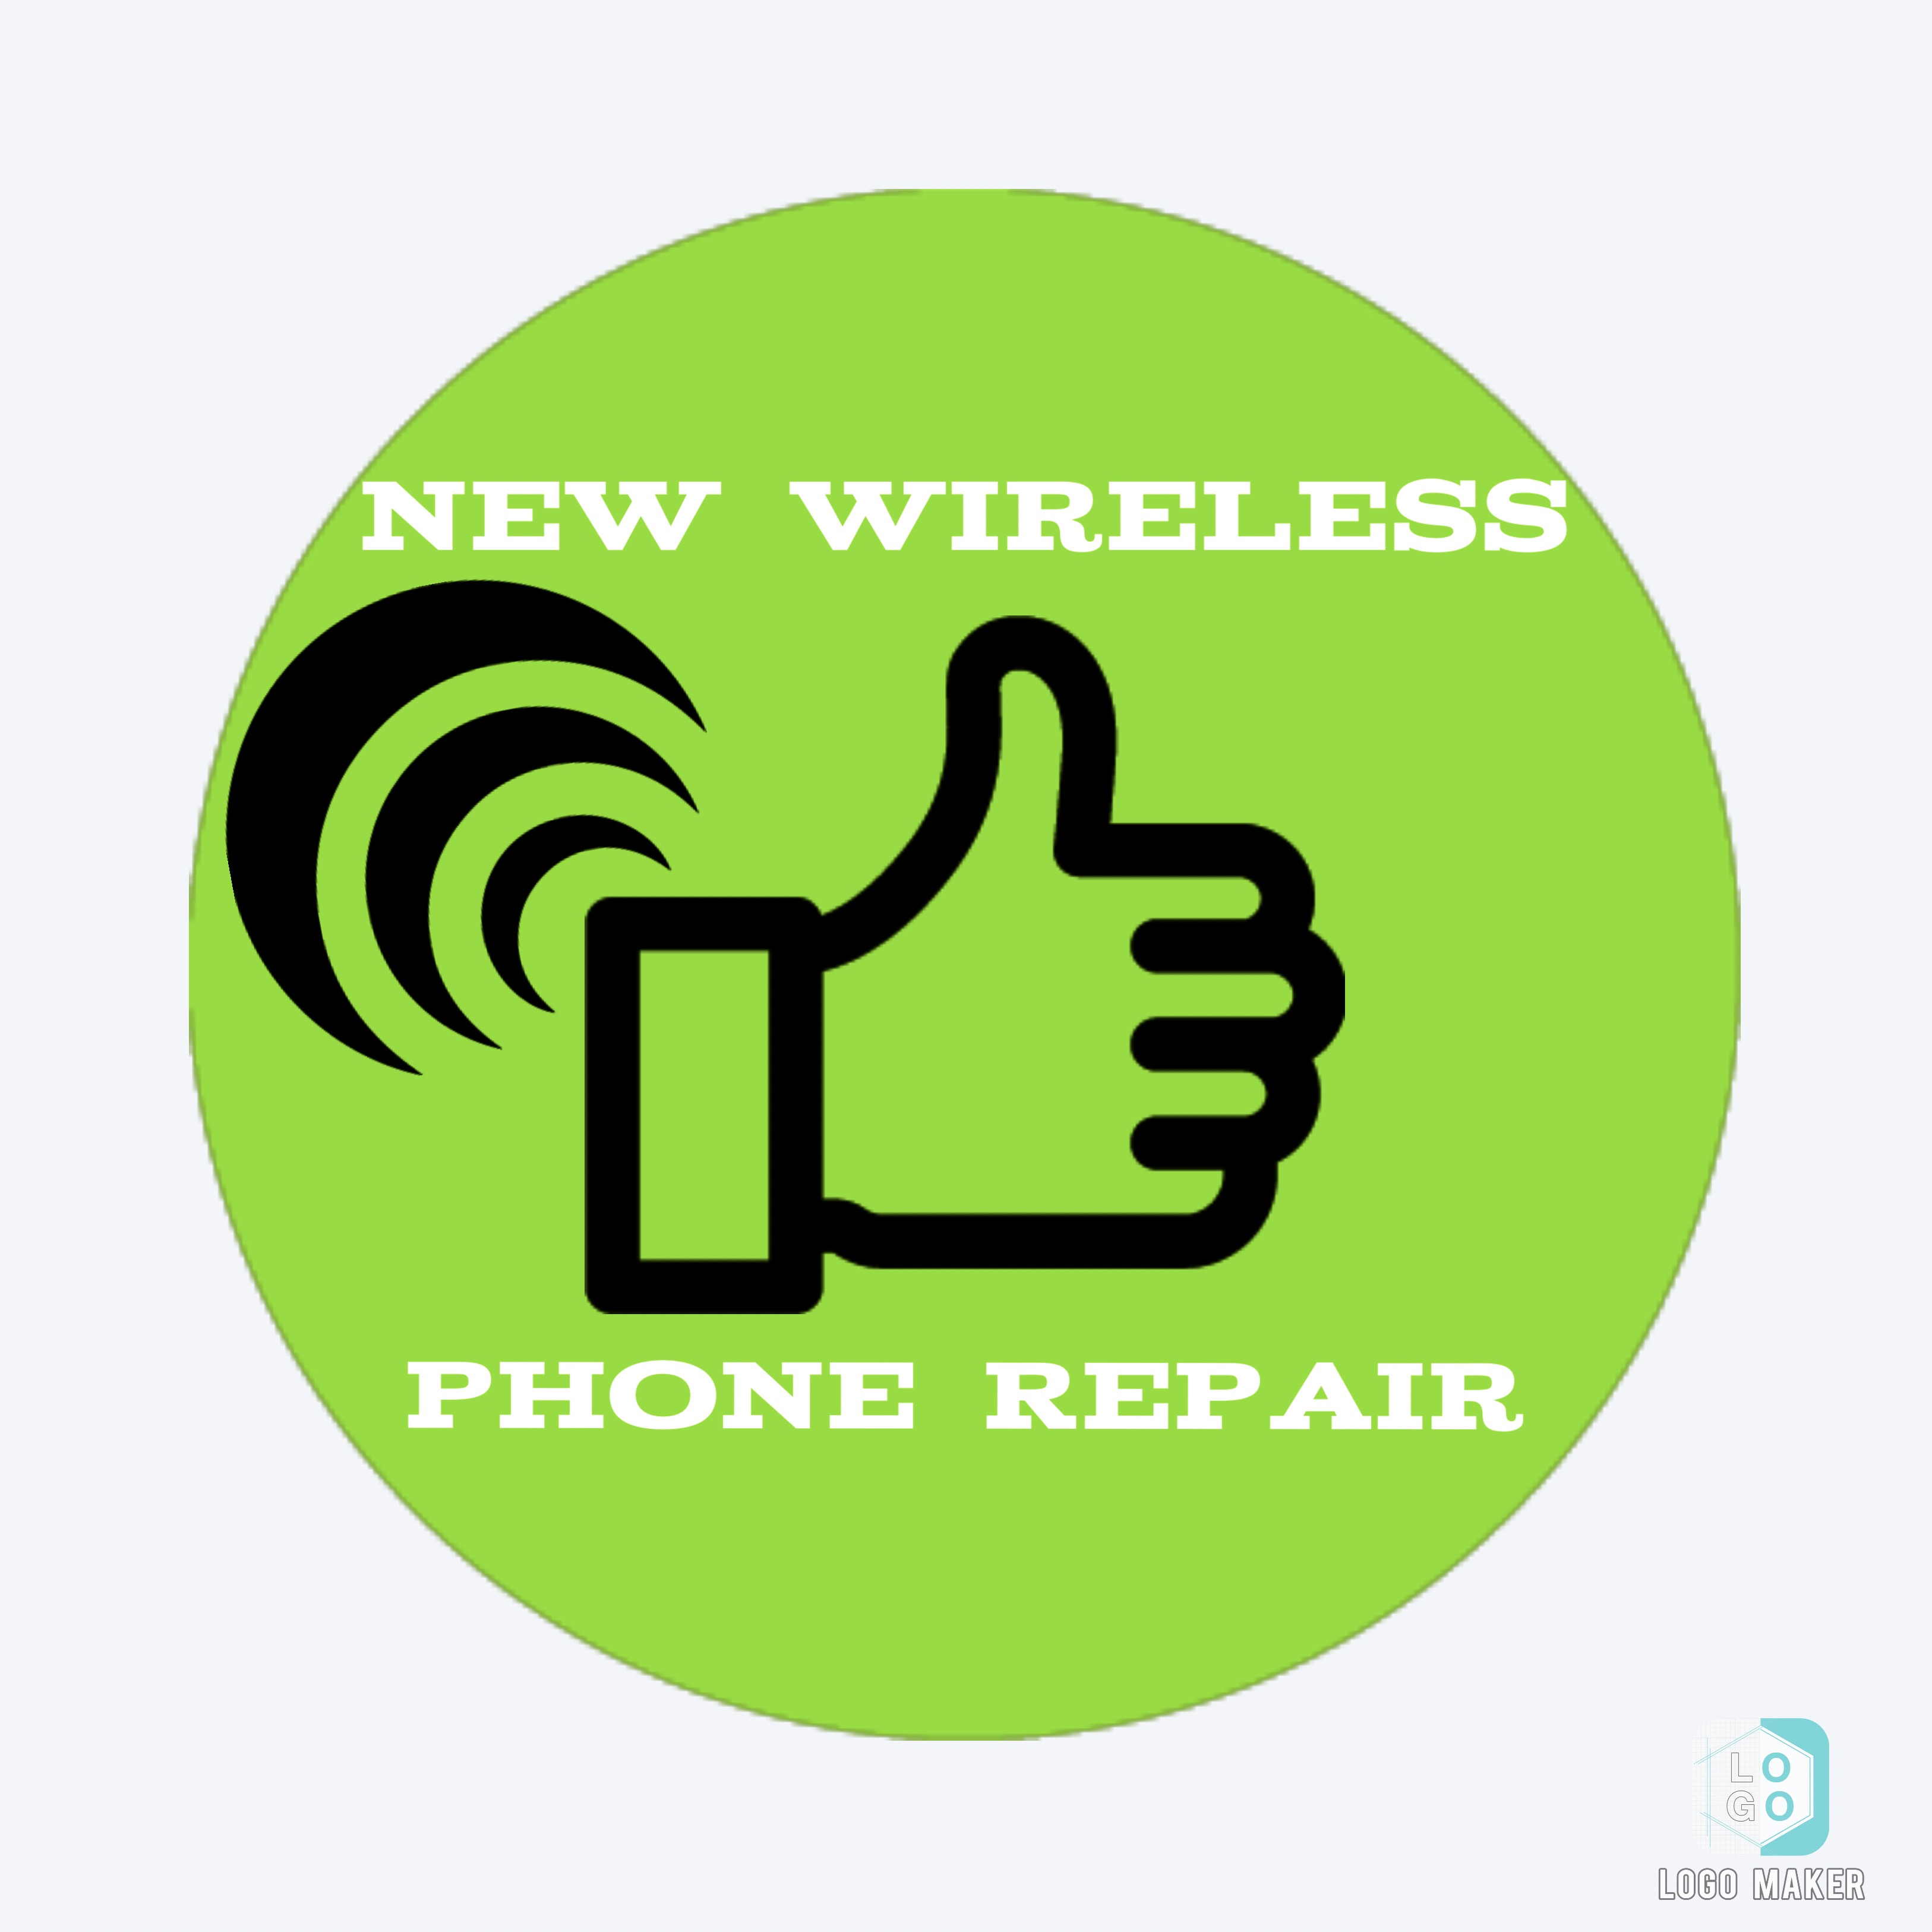 New wireless cellphone repair